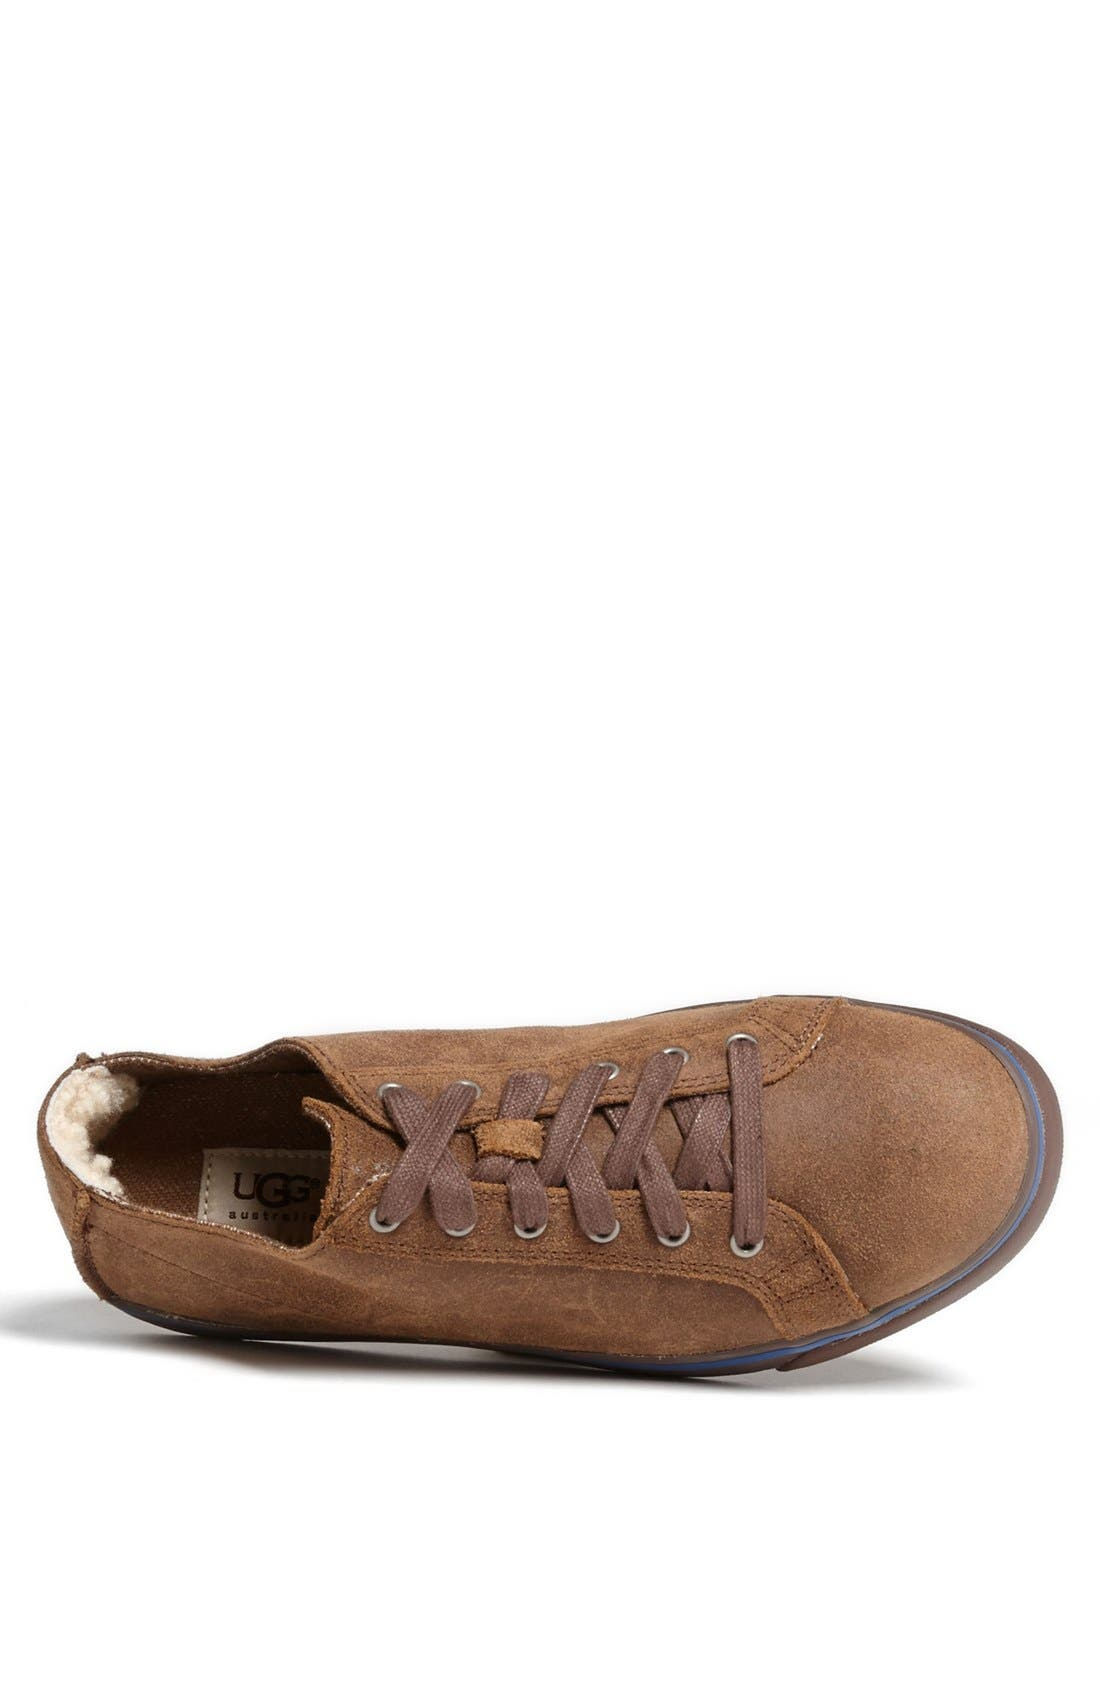 Australia 'Vanowen' Sneaker,                             Alternate thumbnail 8, color,